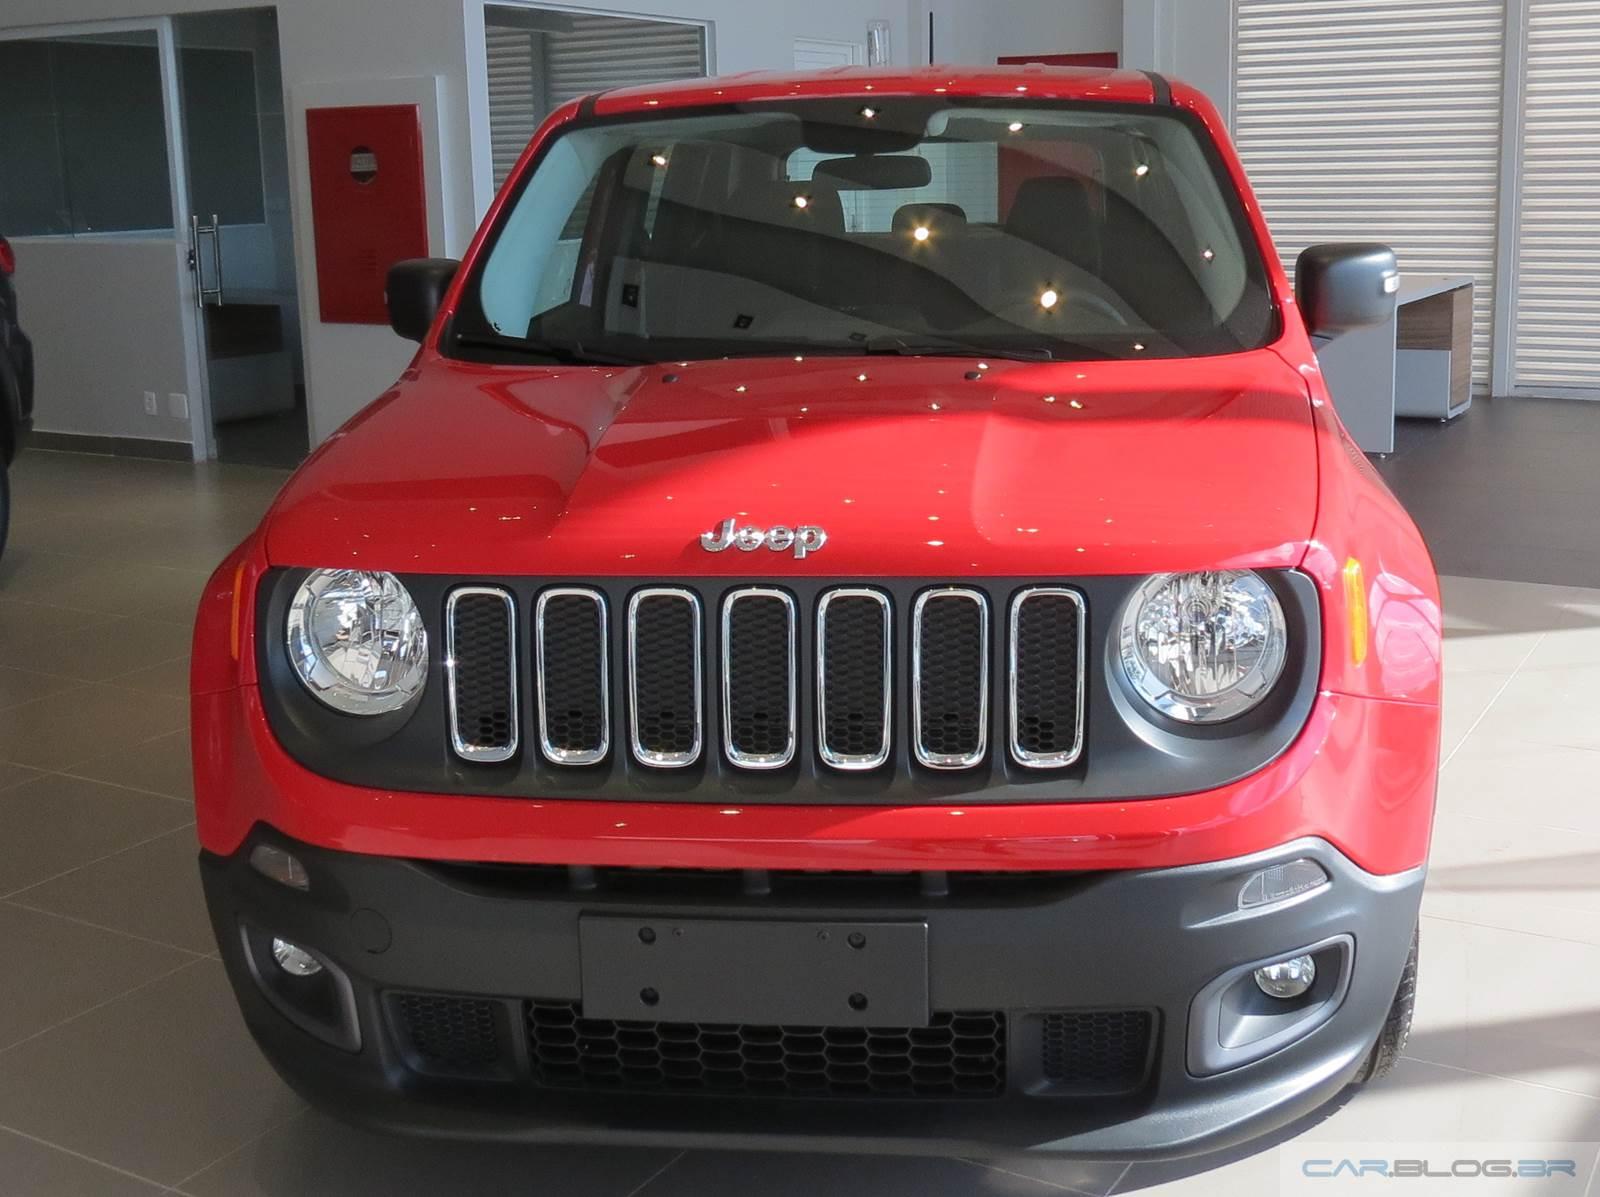 Famosos Jeep Renegade Flex: fotos e vídeo do modelo de R$ 69.9 mil | CAR  YA64